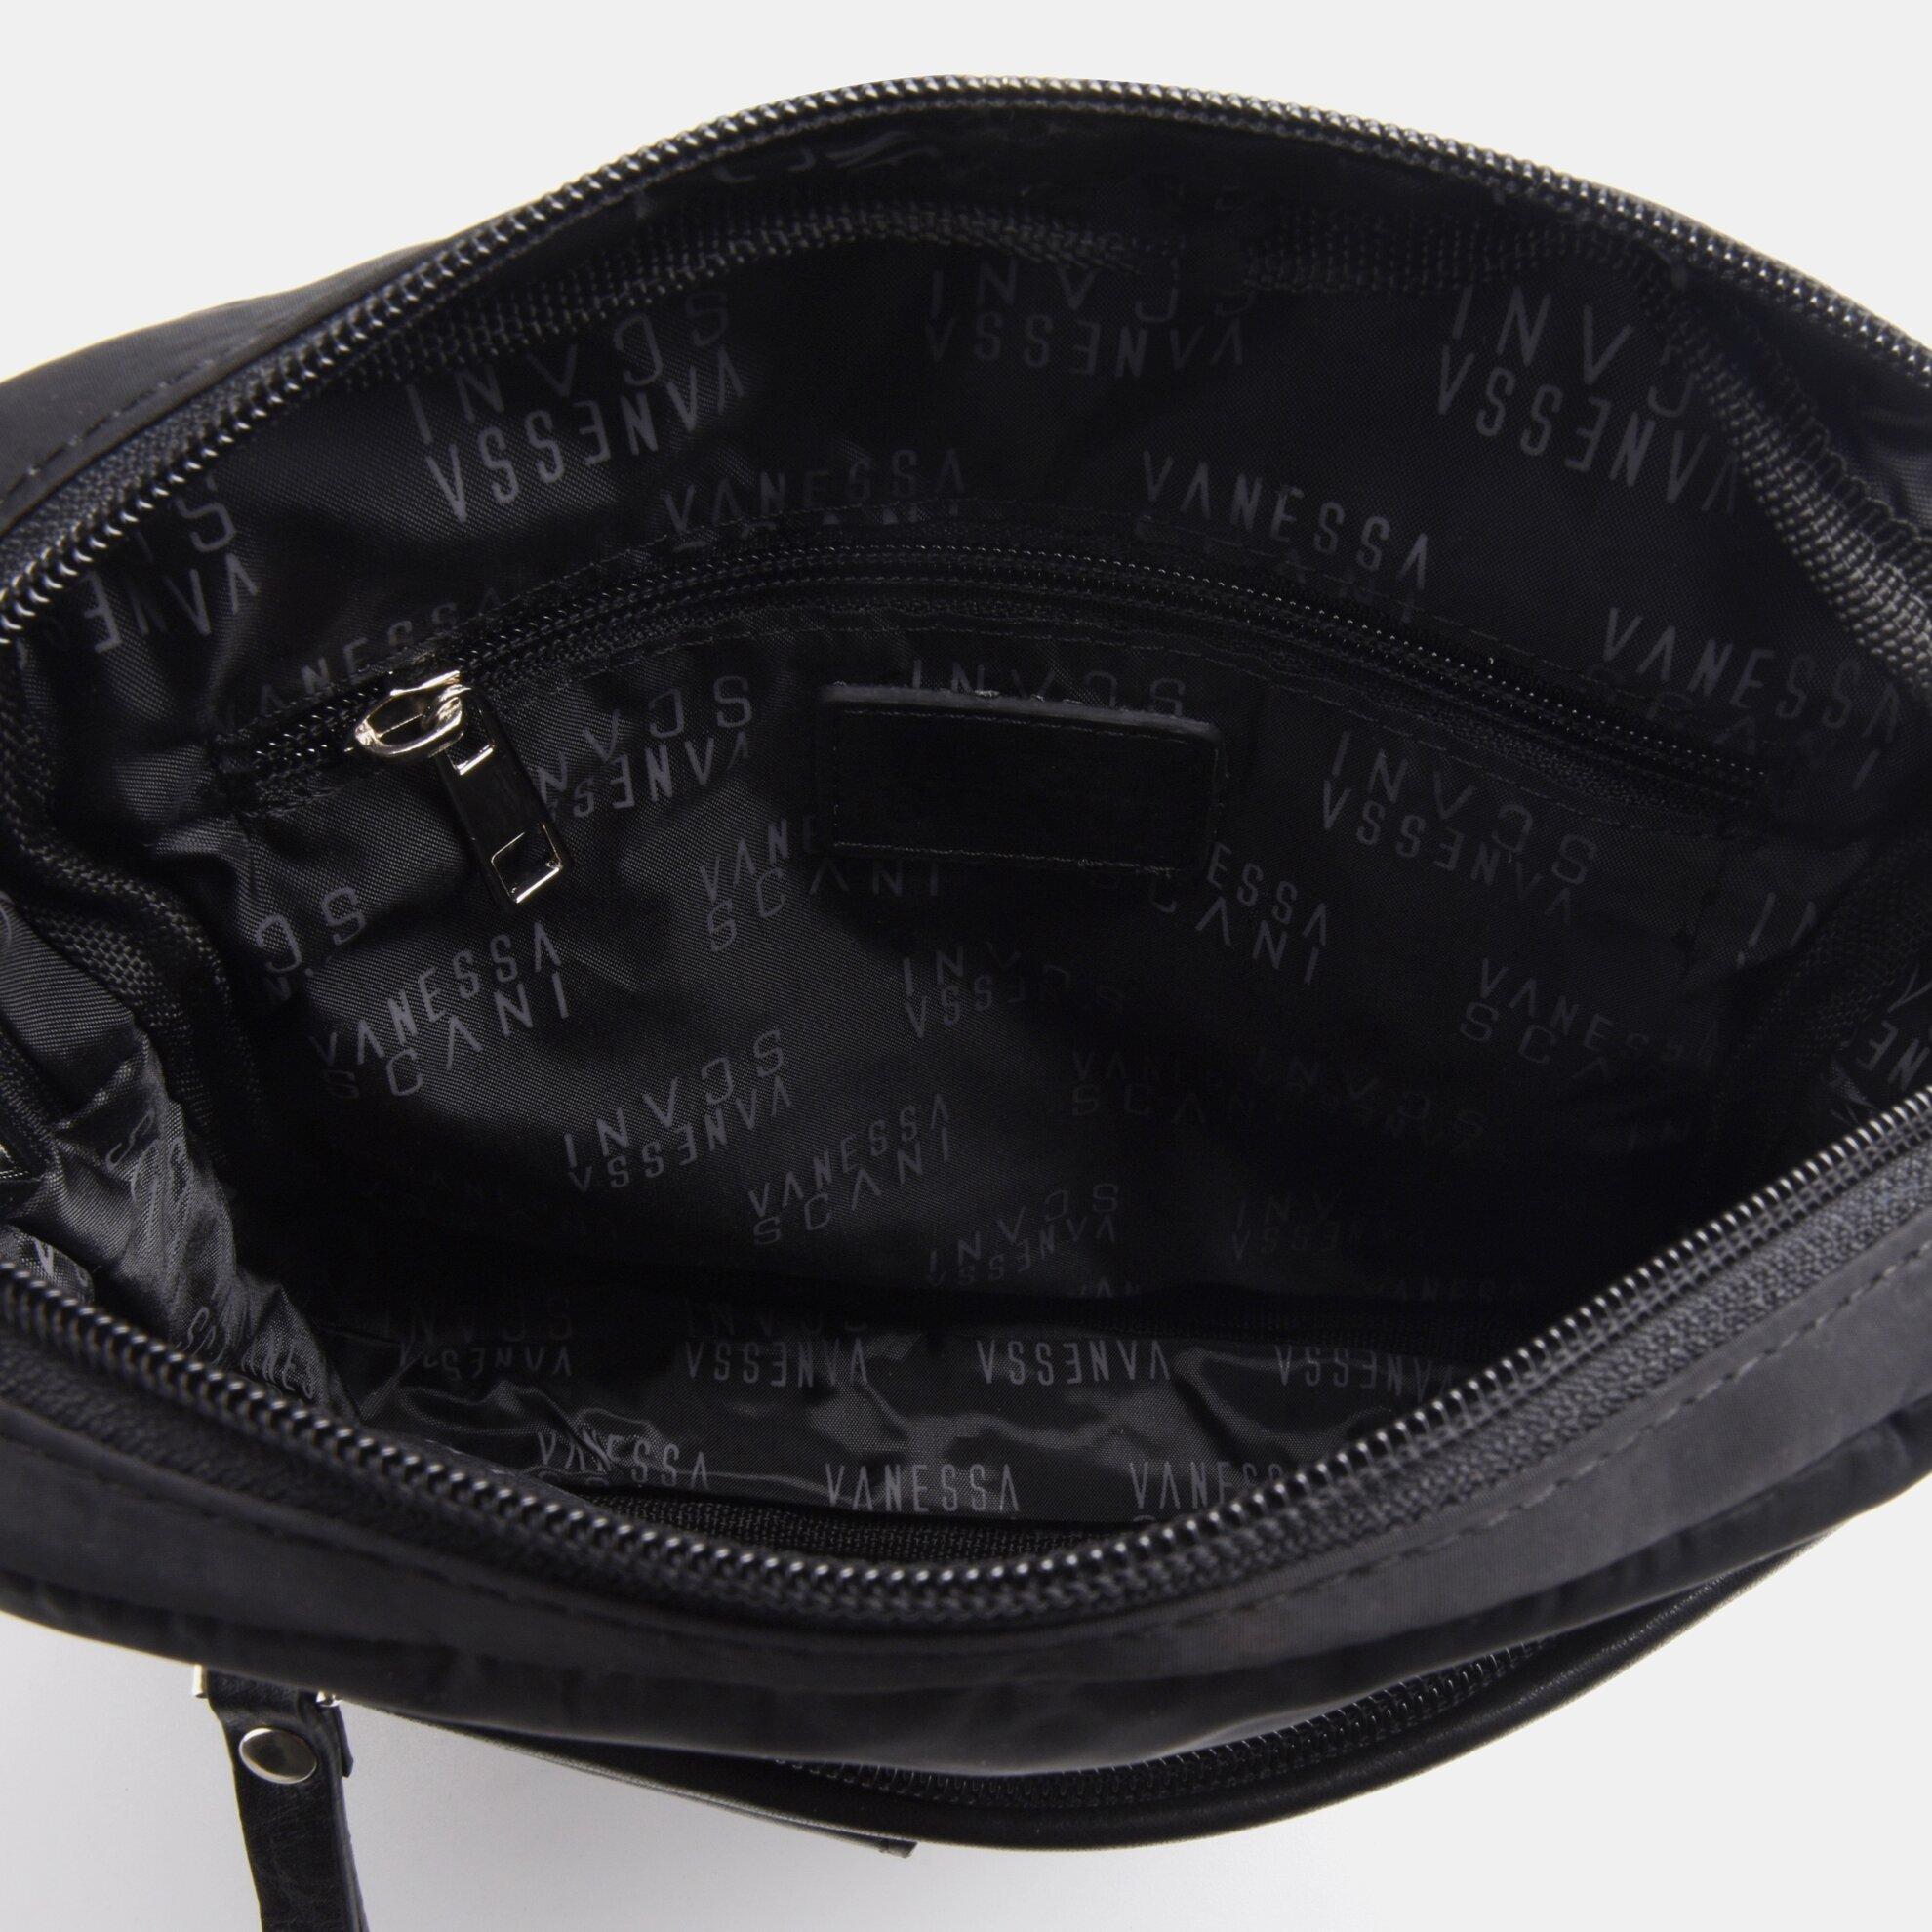 resm Tekstil ve Hakiki Deri Siyah Erkek Çanta